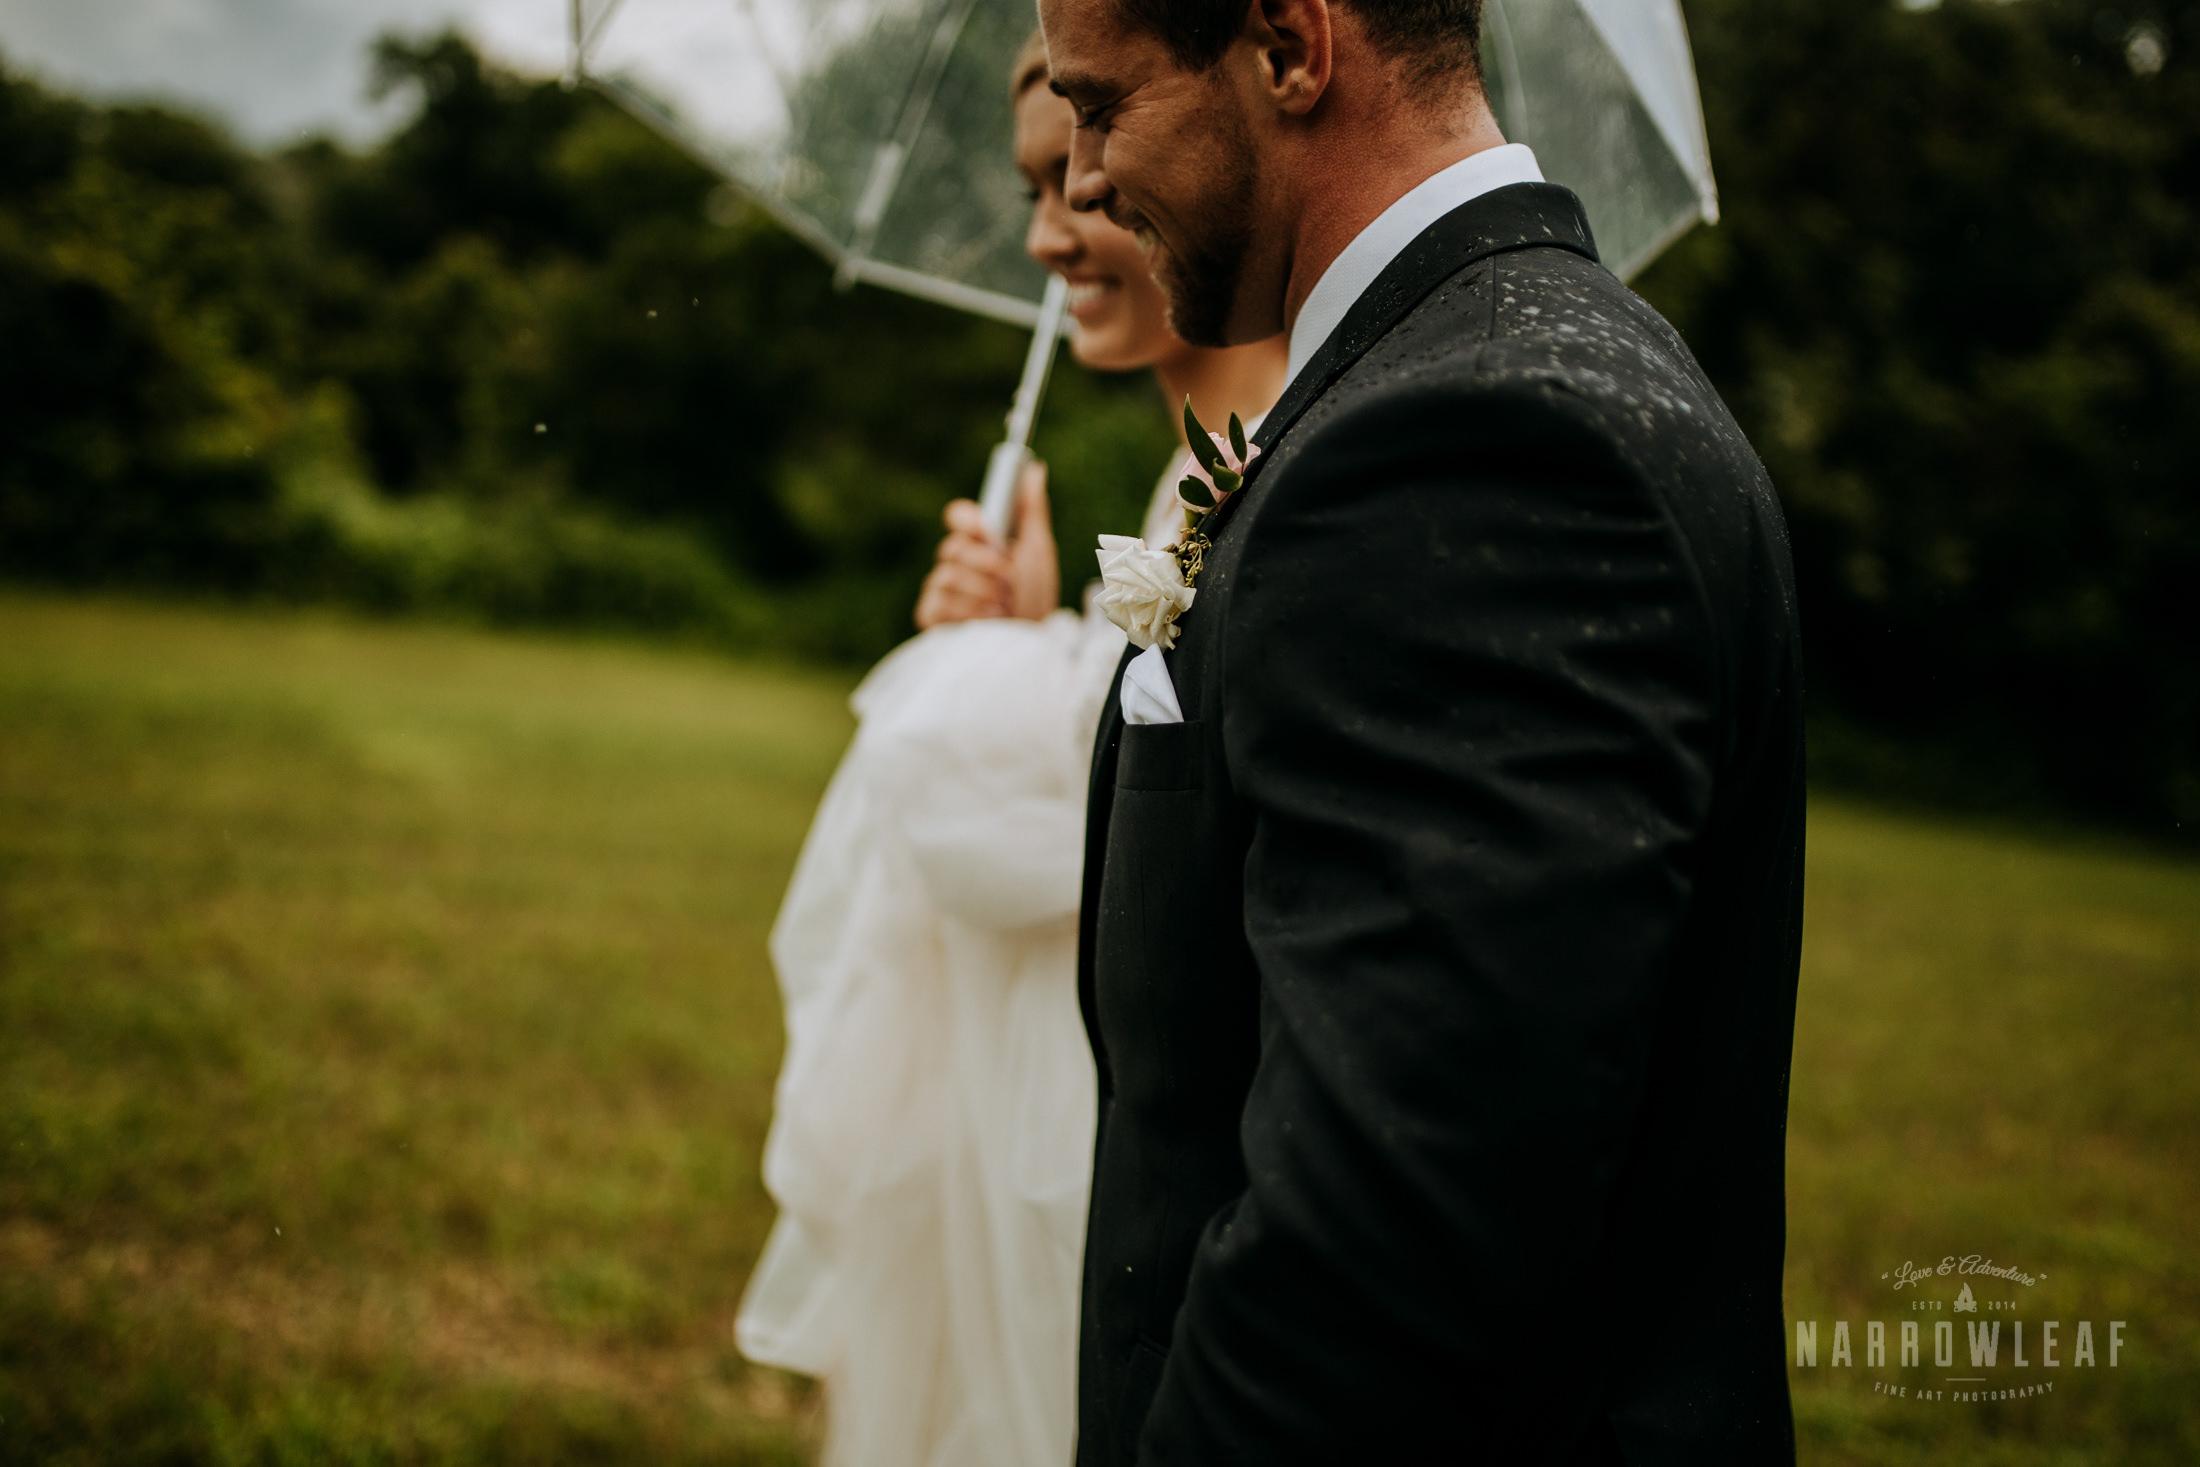 John-P-Furber-Farm-Minnesota-wedding-photographer-Narrowleaf_Love_and_Adventure_Photography-8978.jpg